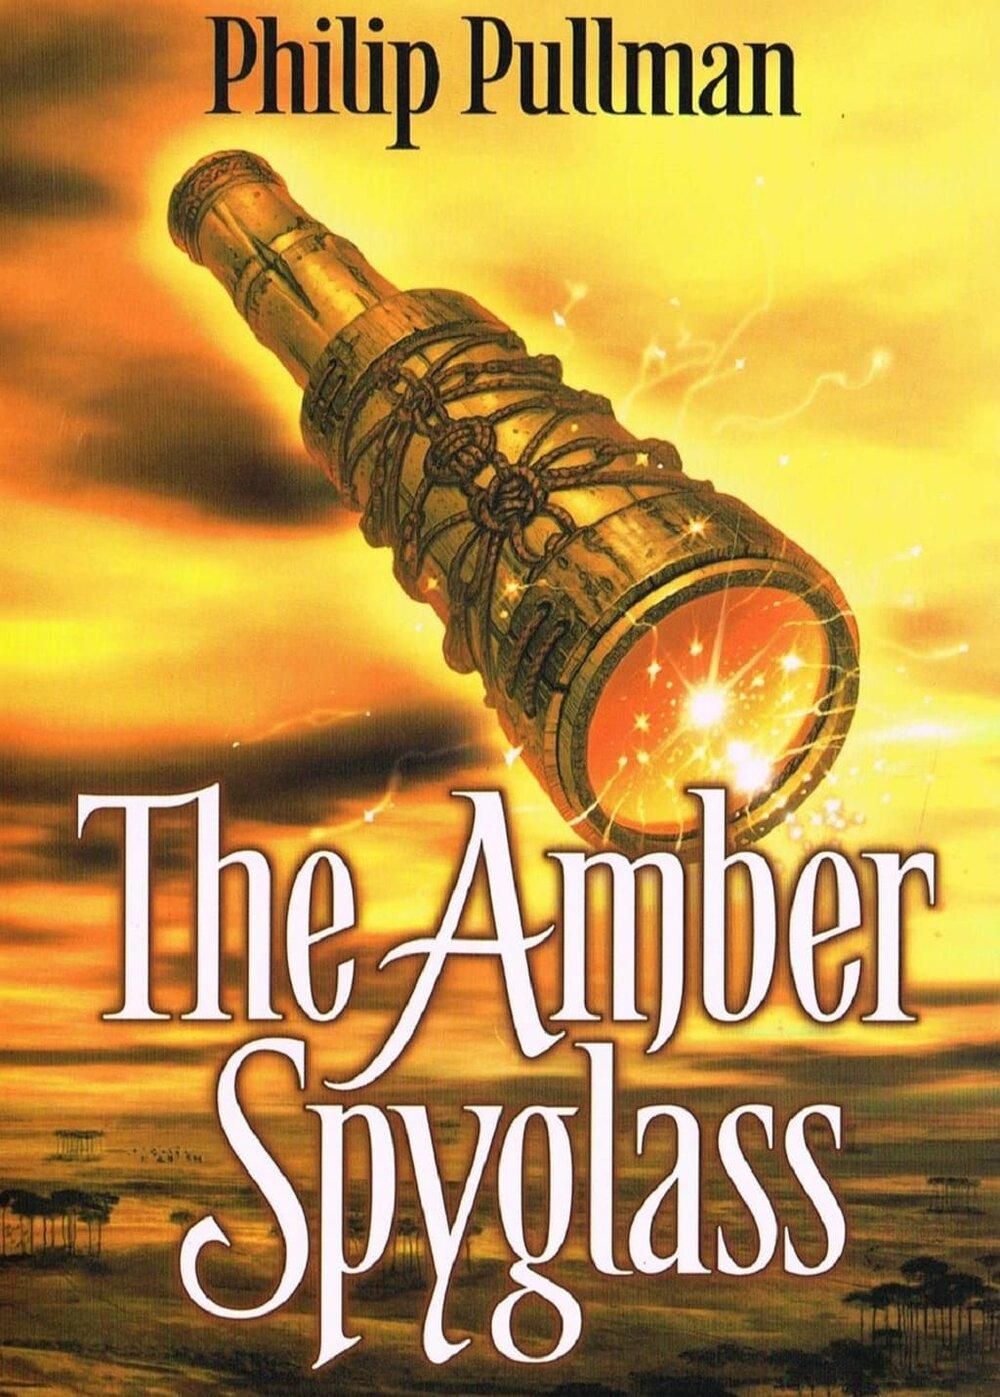 The-Amber-Spyglass-Audiobook-Free-Download.jpg